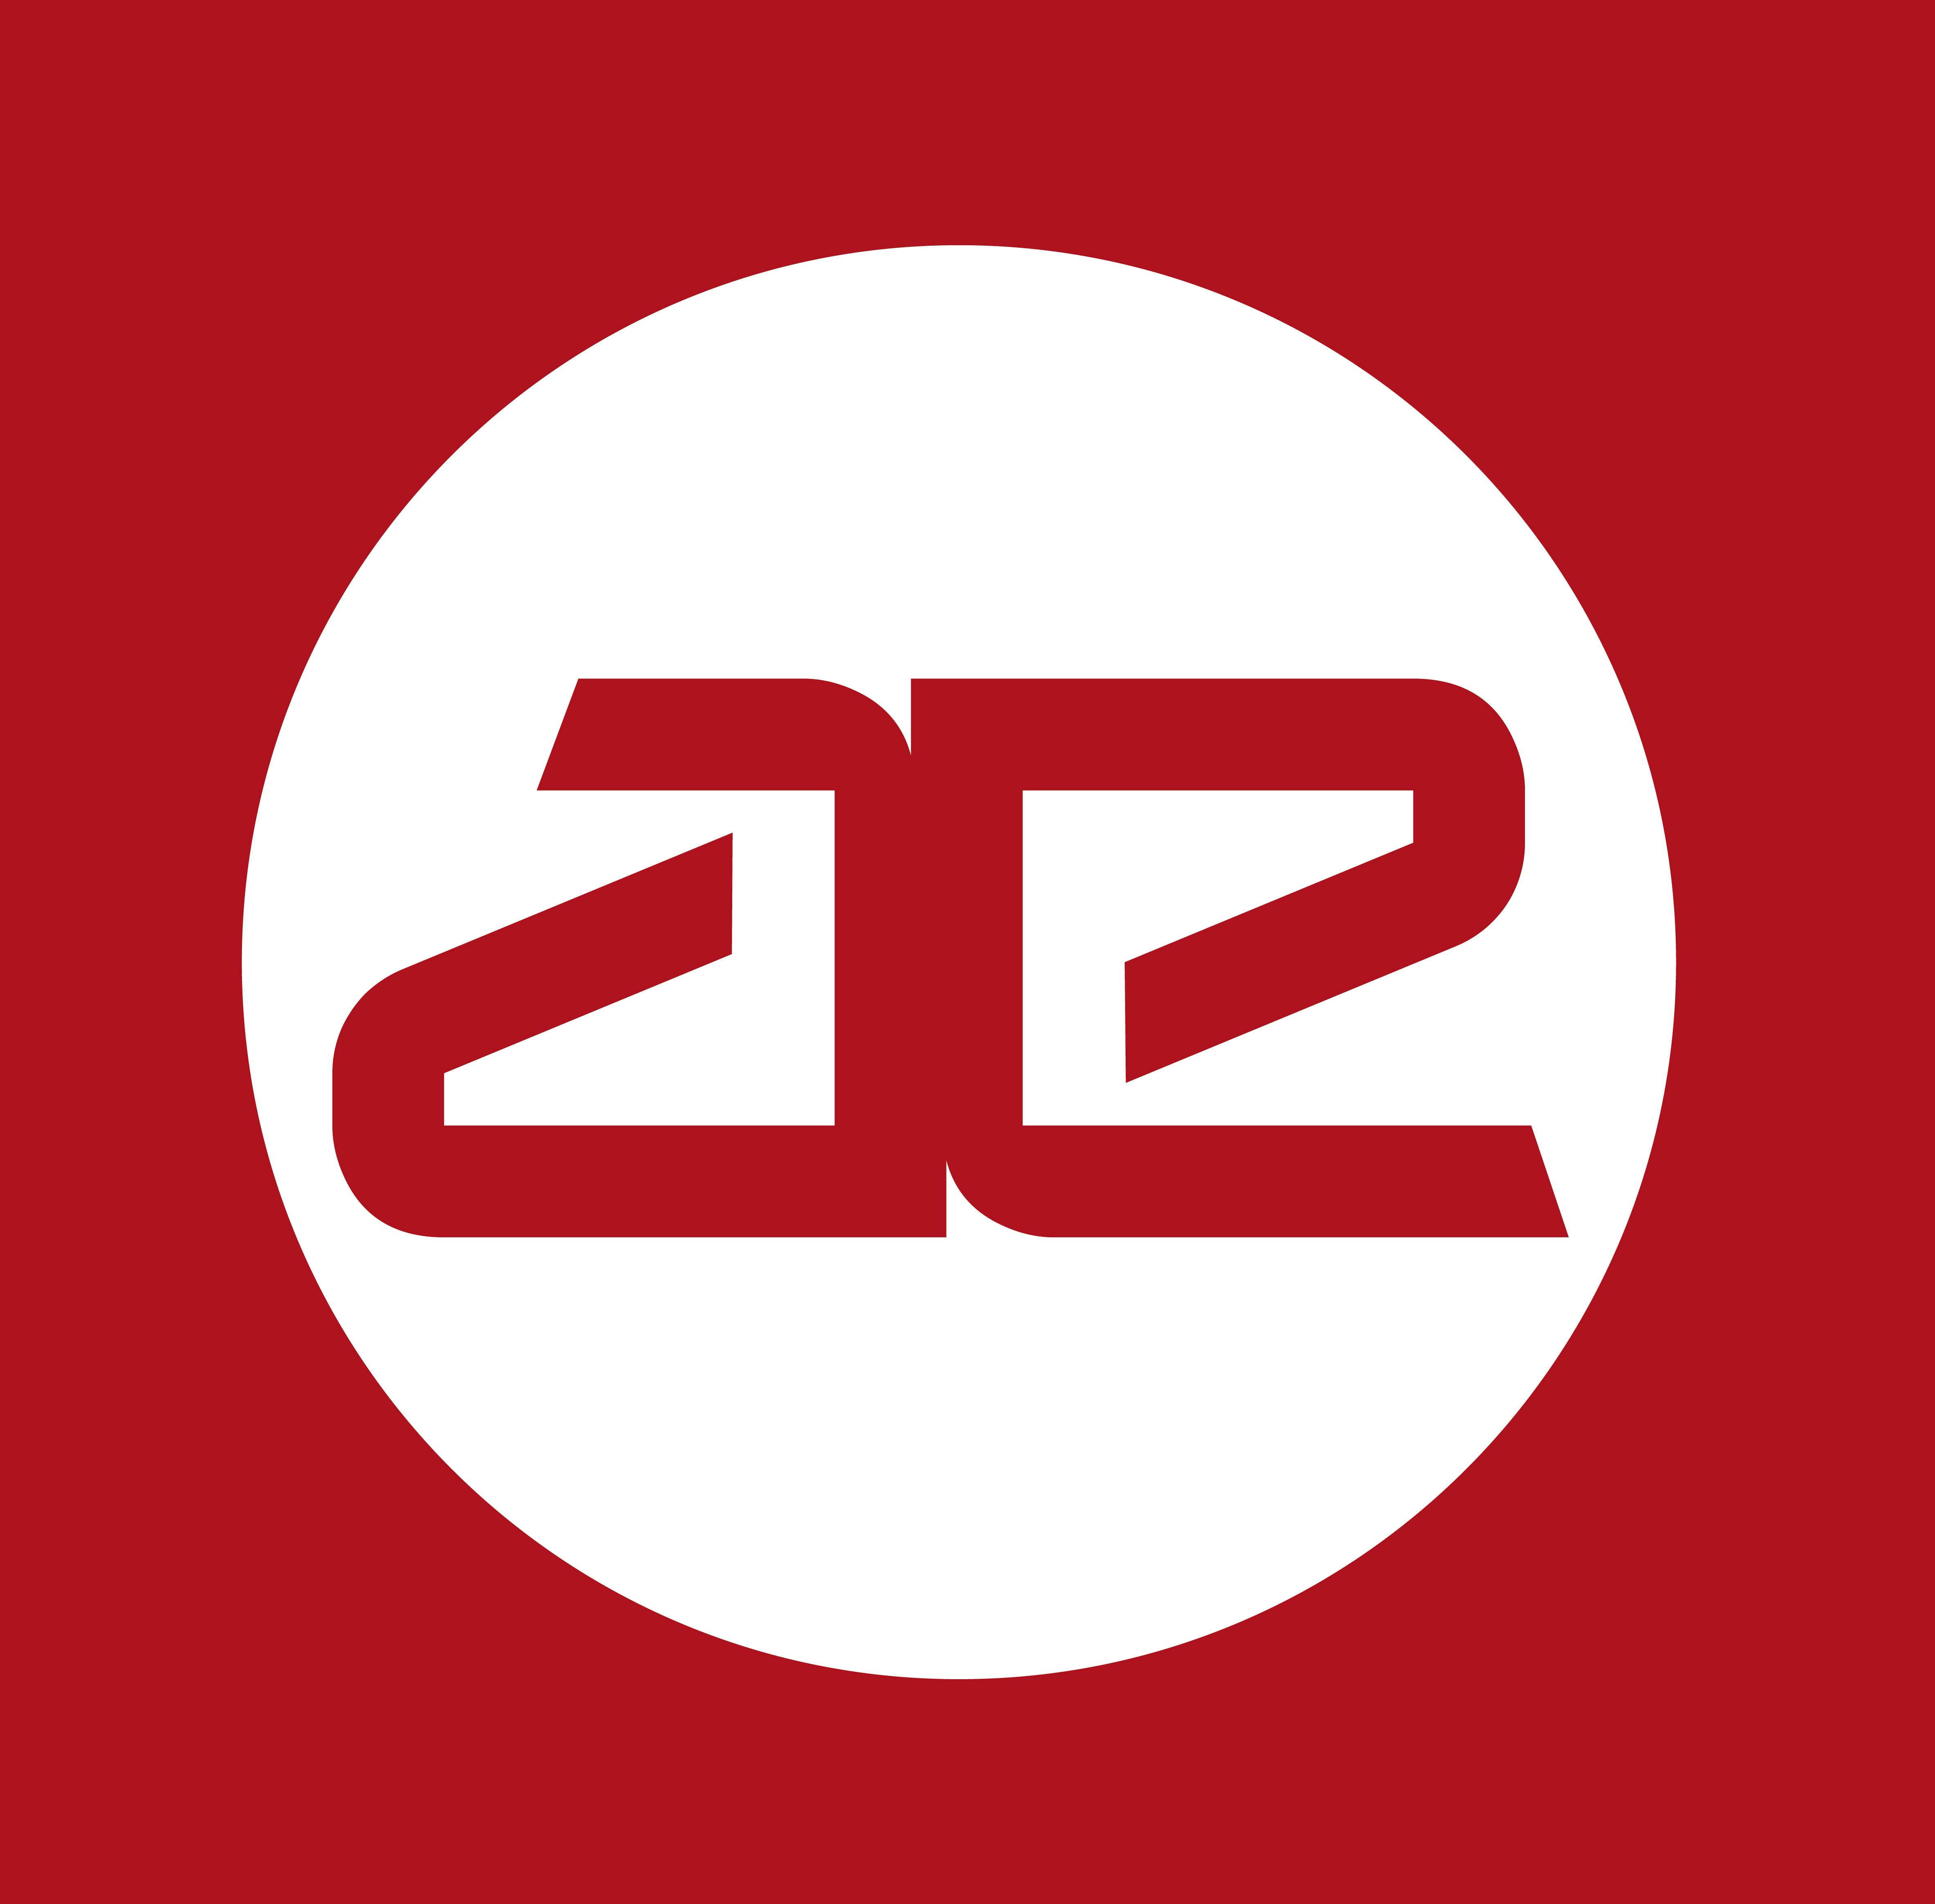 Dyneemite - Ultralight Highline Project Webbing